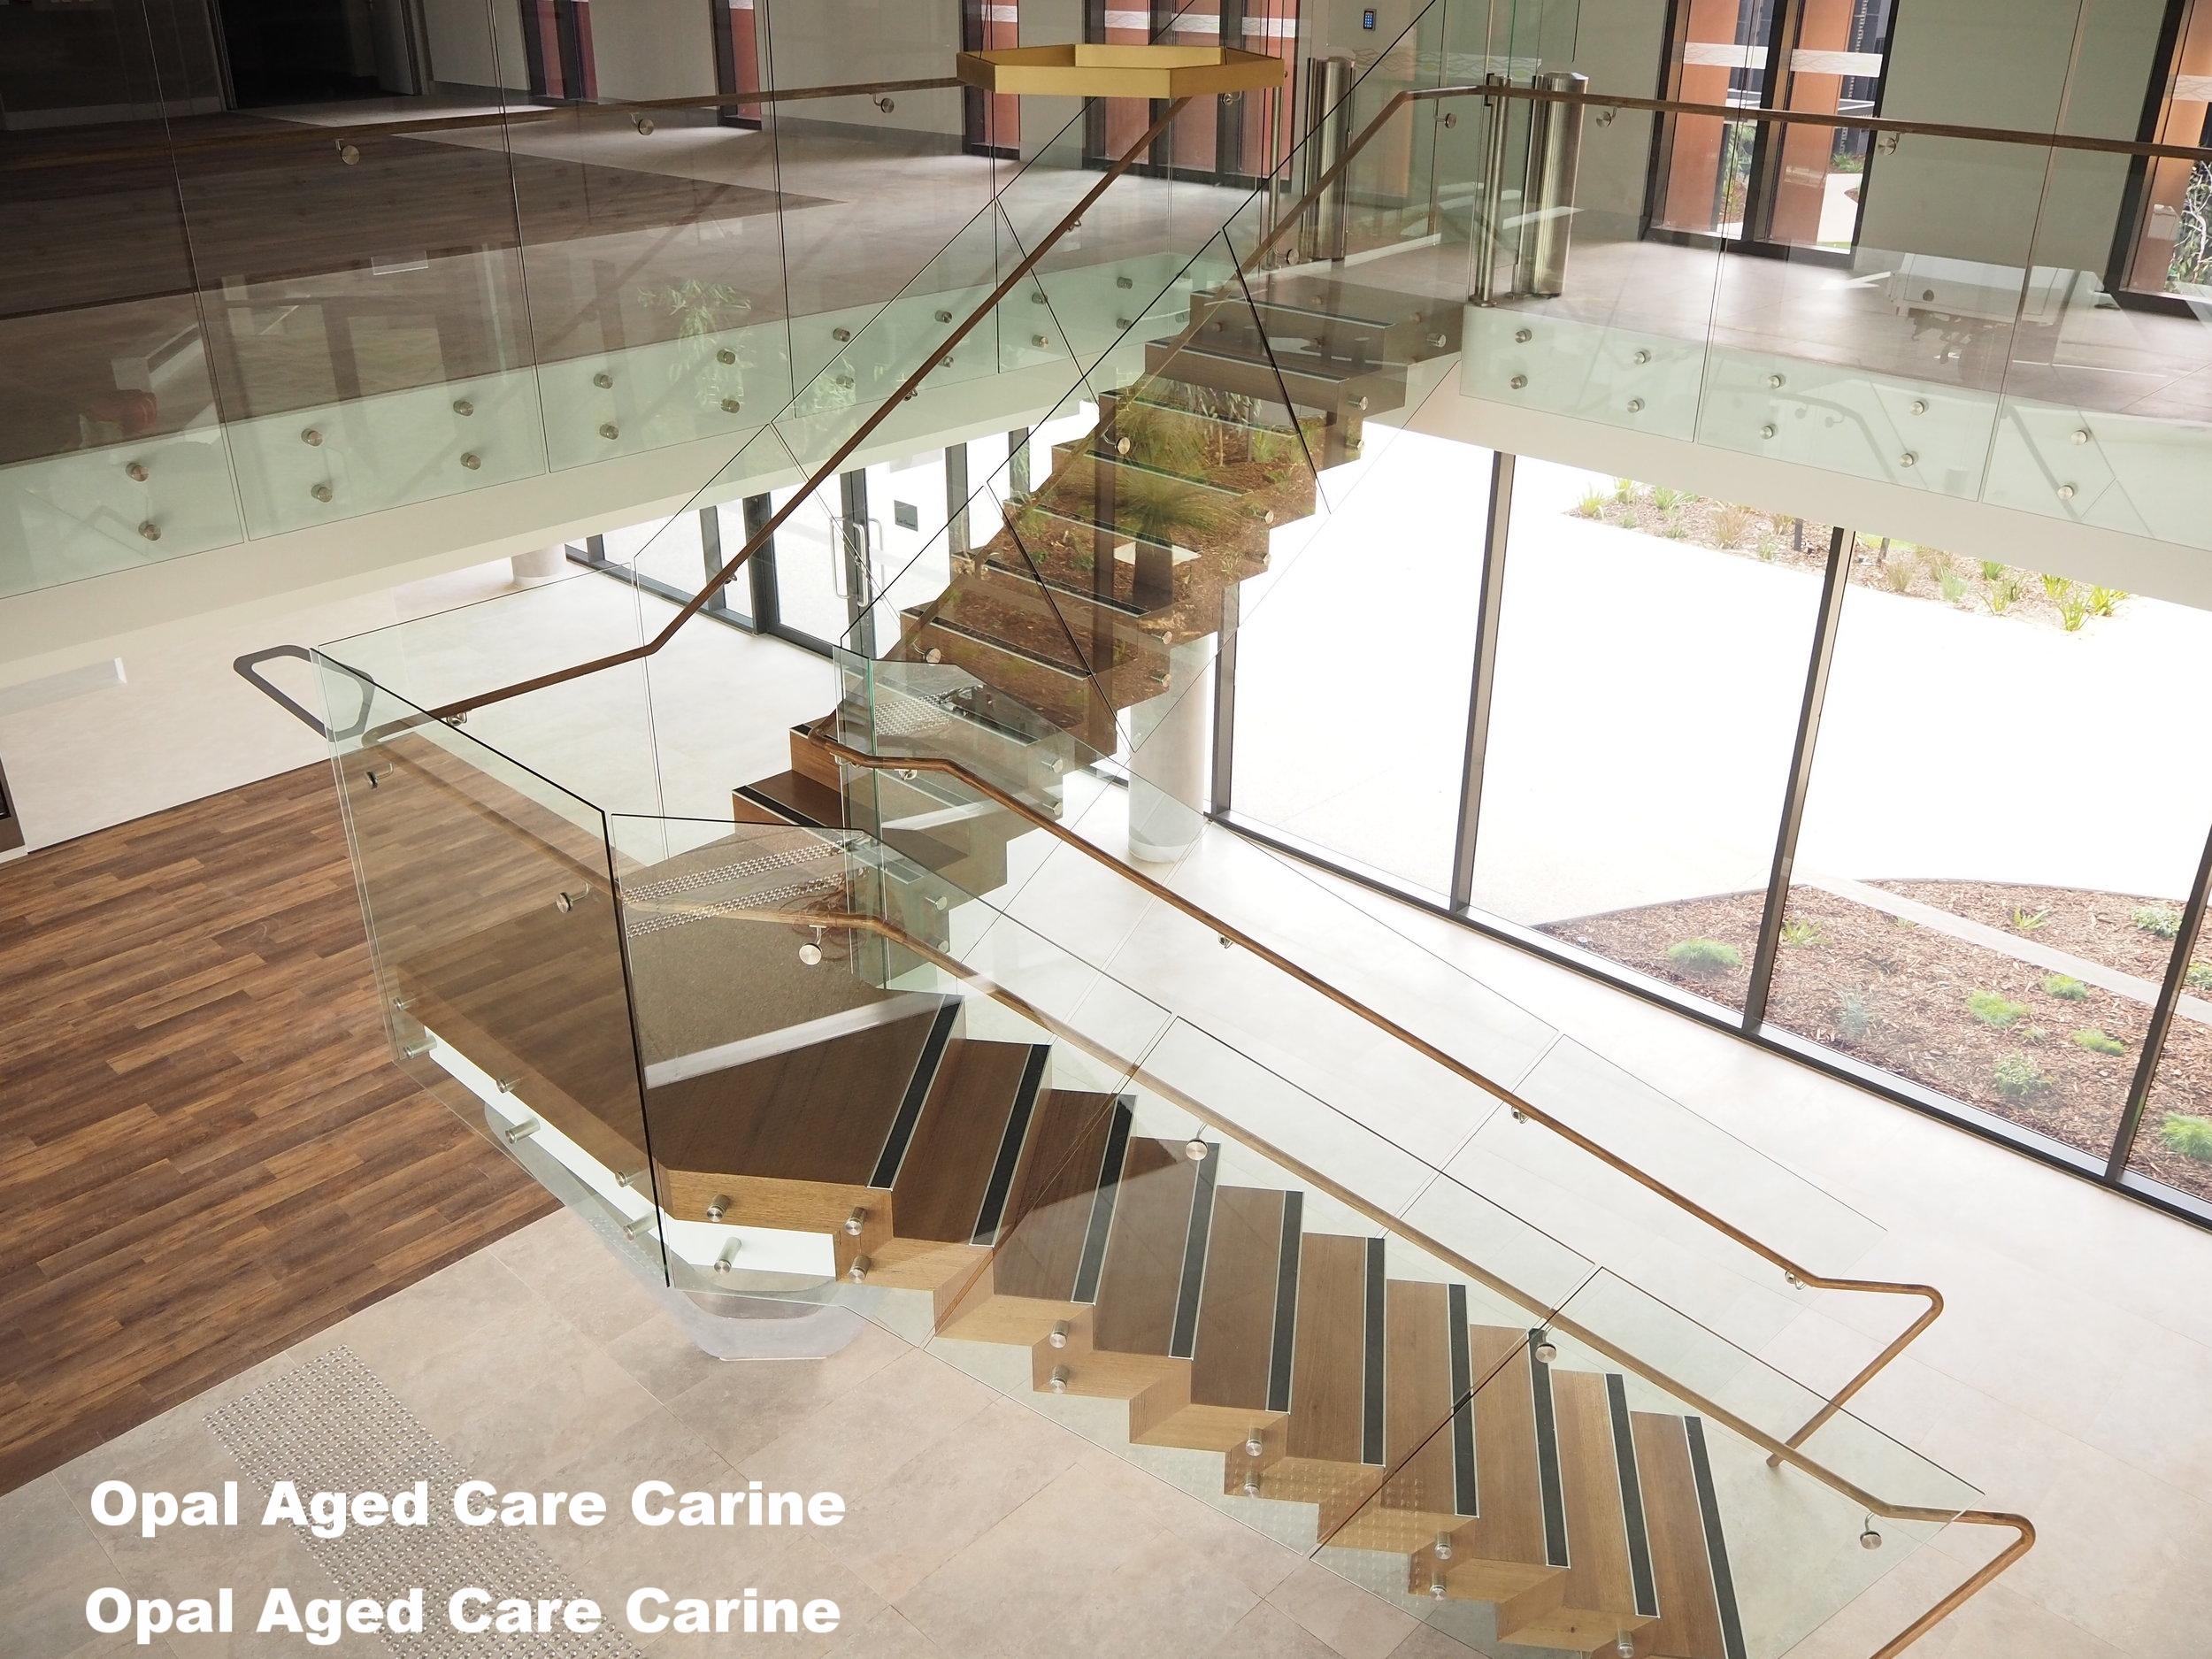 opal carine frameless glass balustrade timber staircase handrail opal aged care carine.JPG